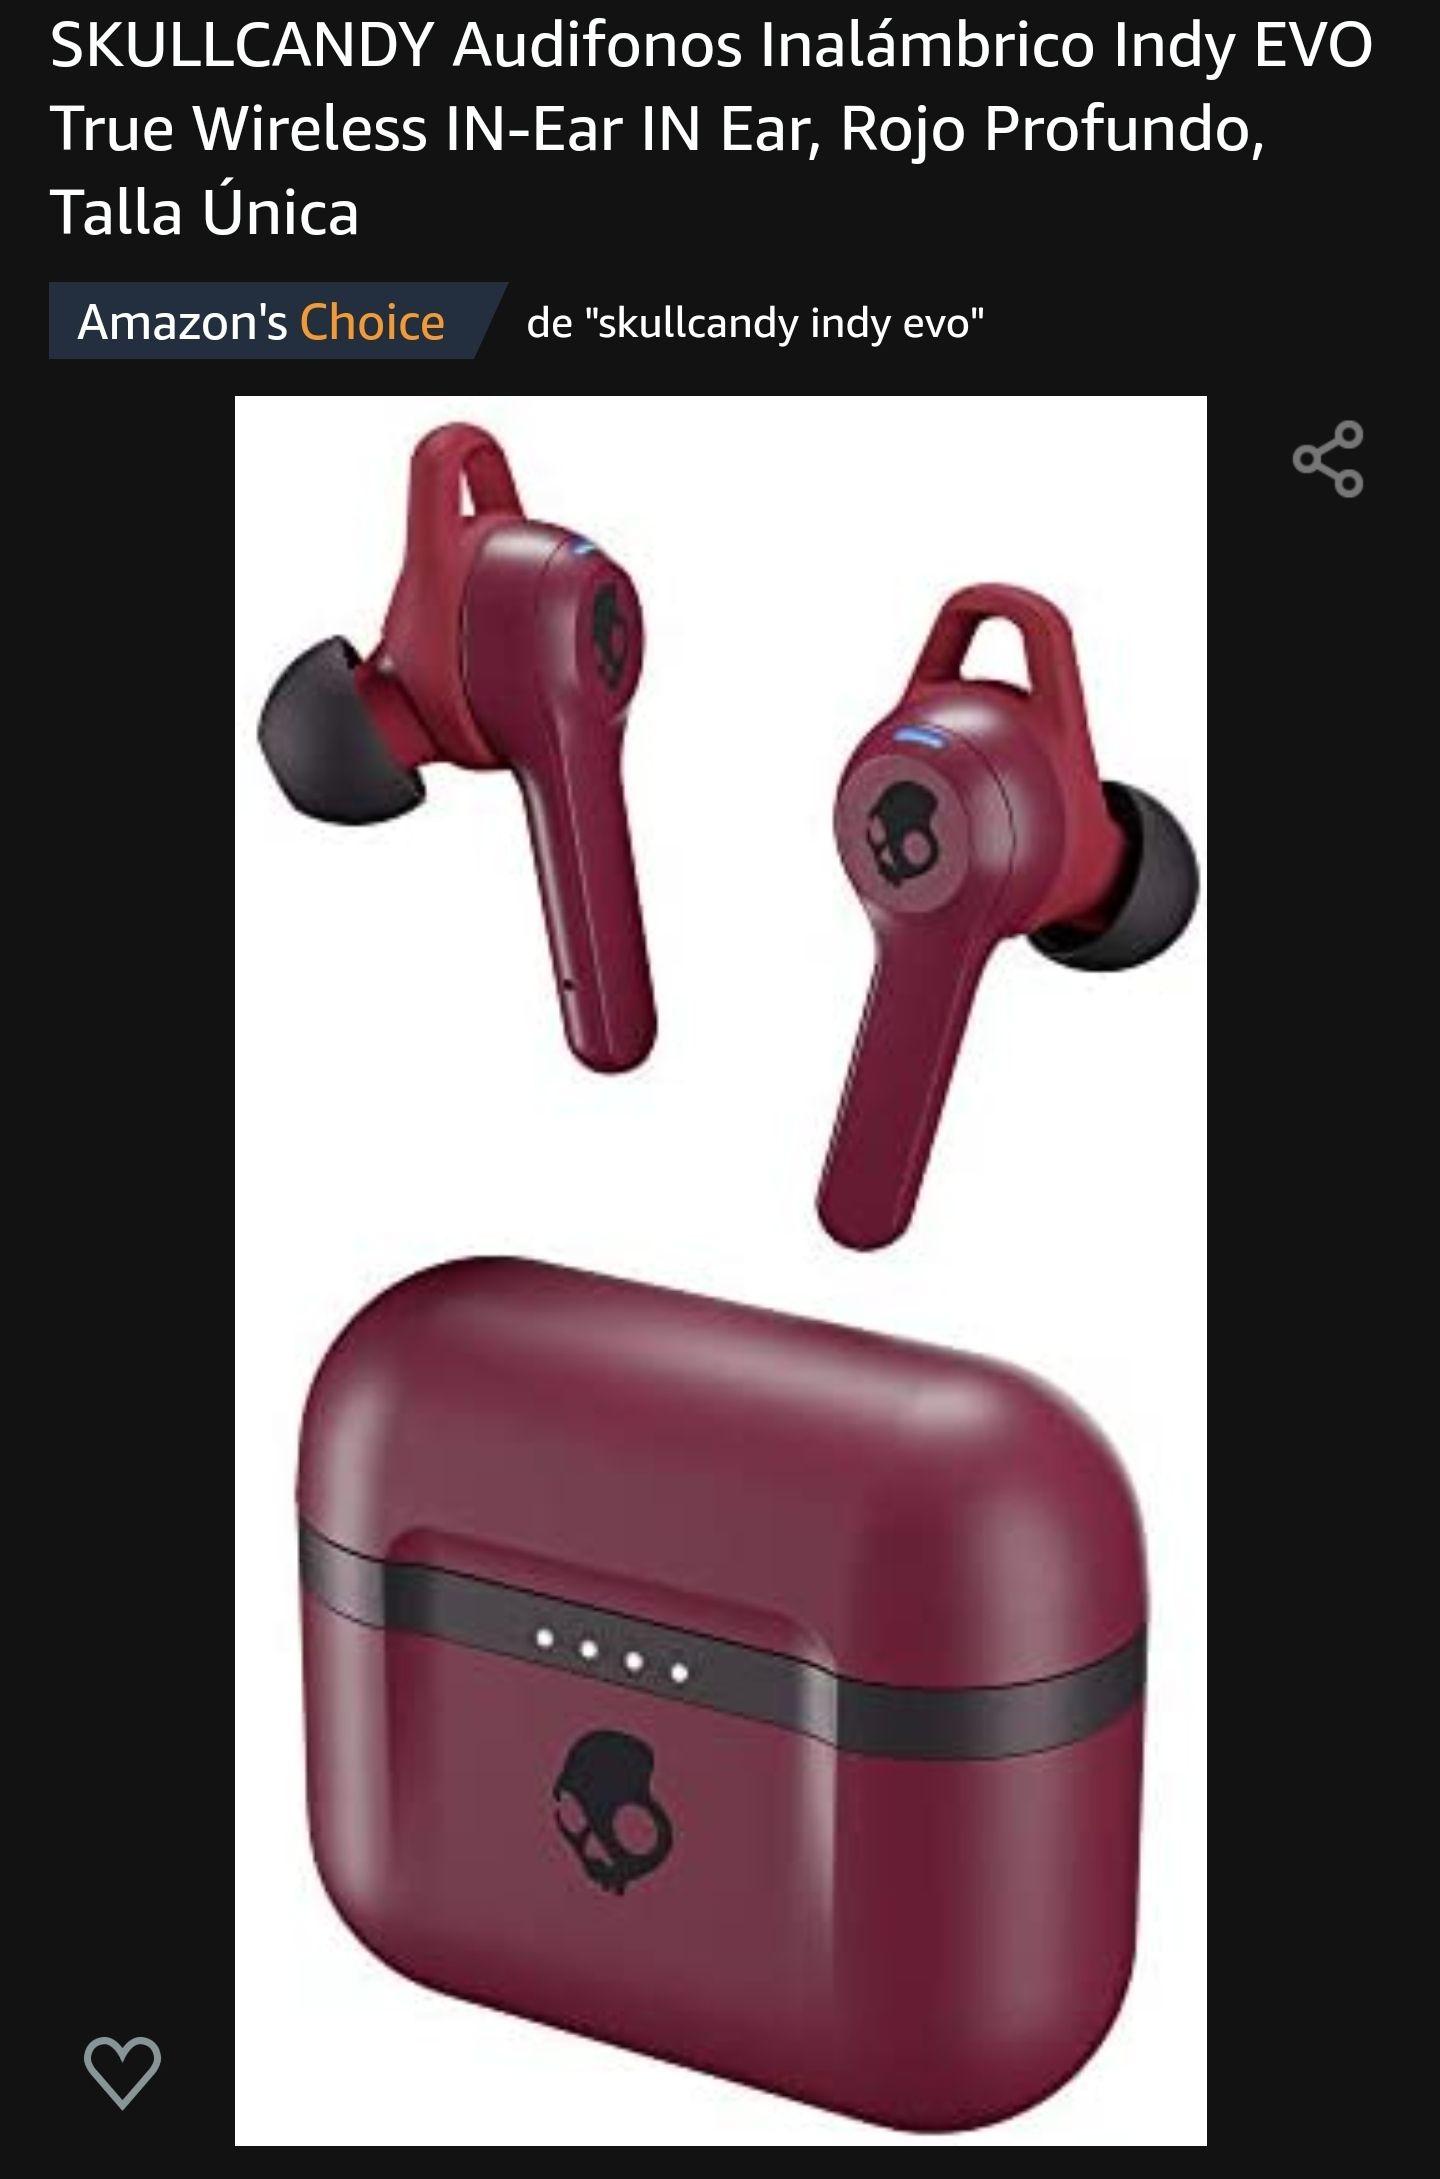 Amazon: SKULLCANDY Audifonos Inalámbrico Indy EVO